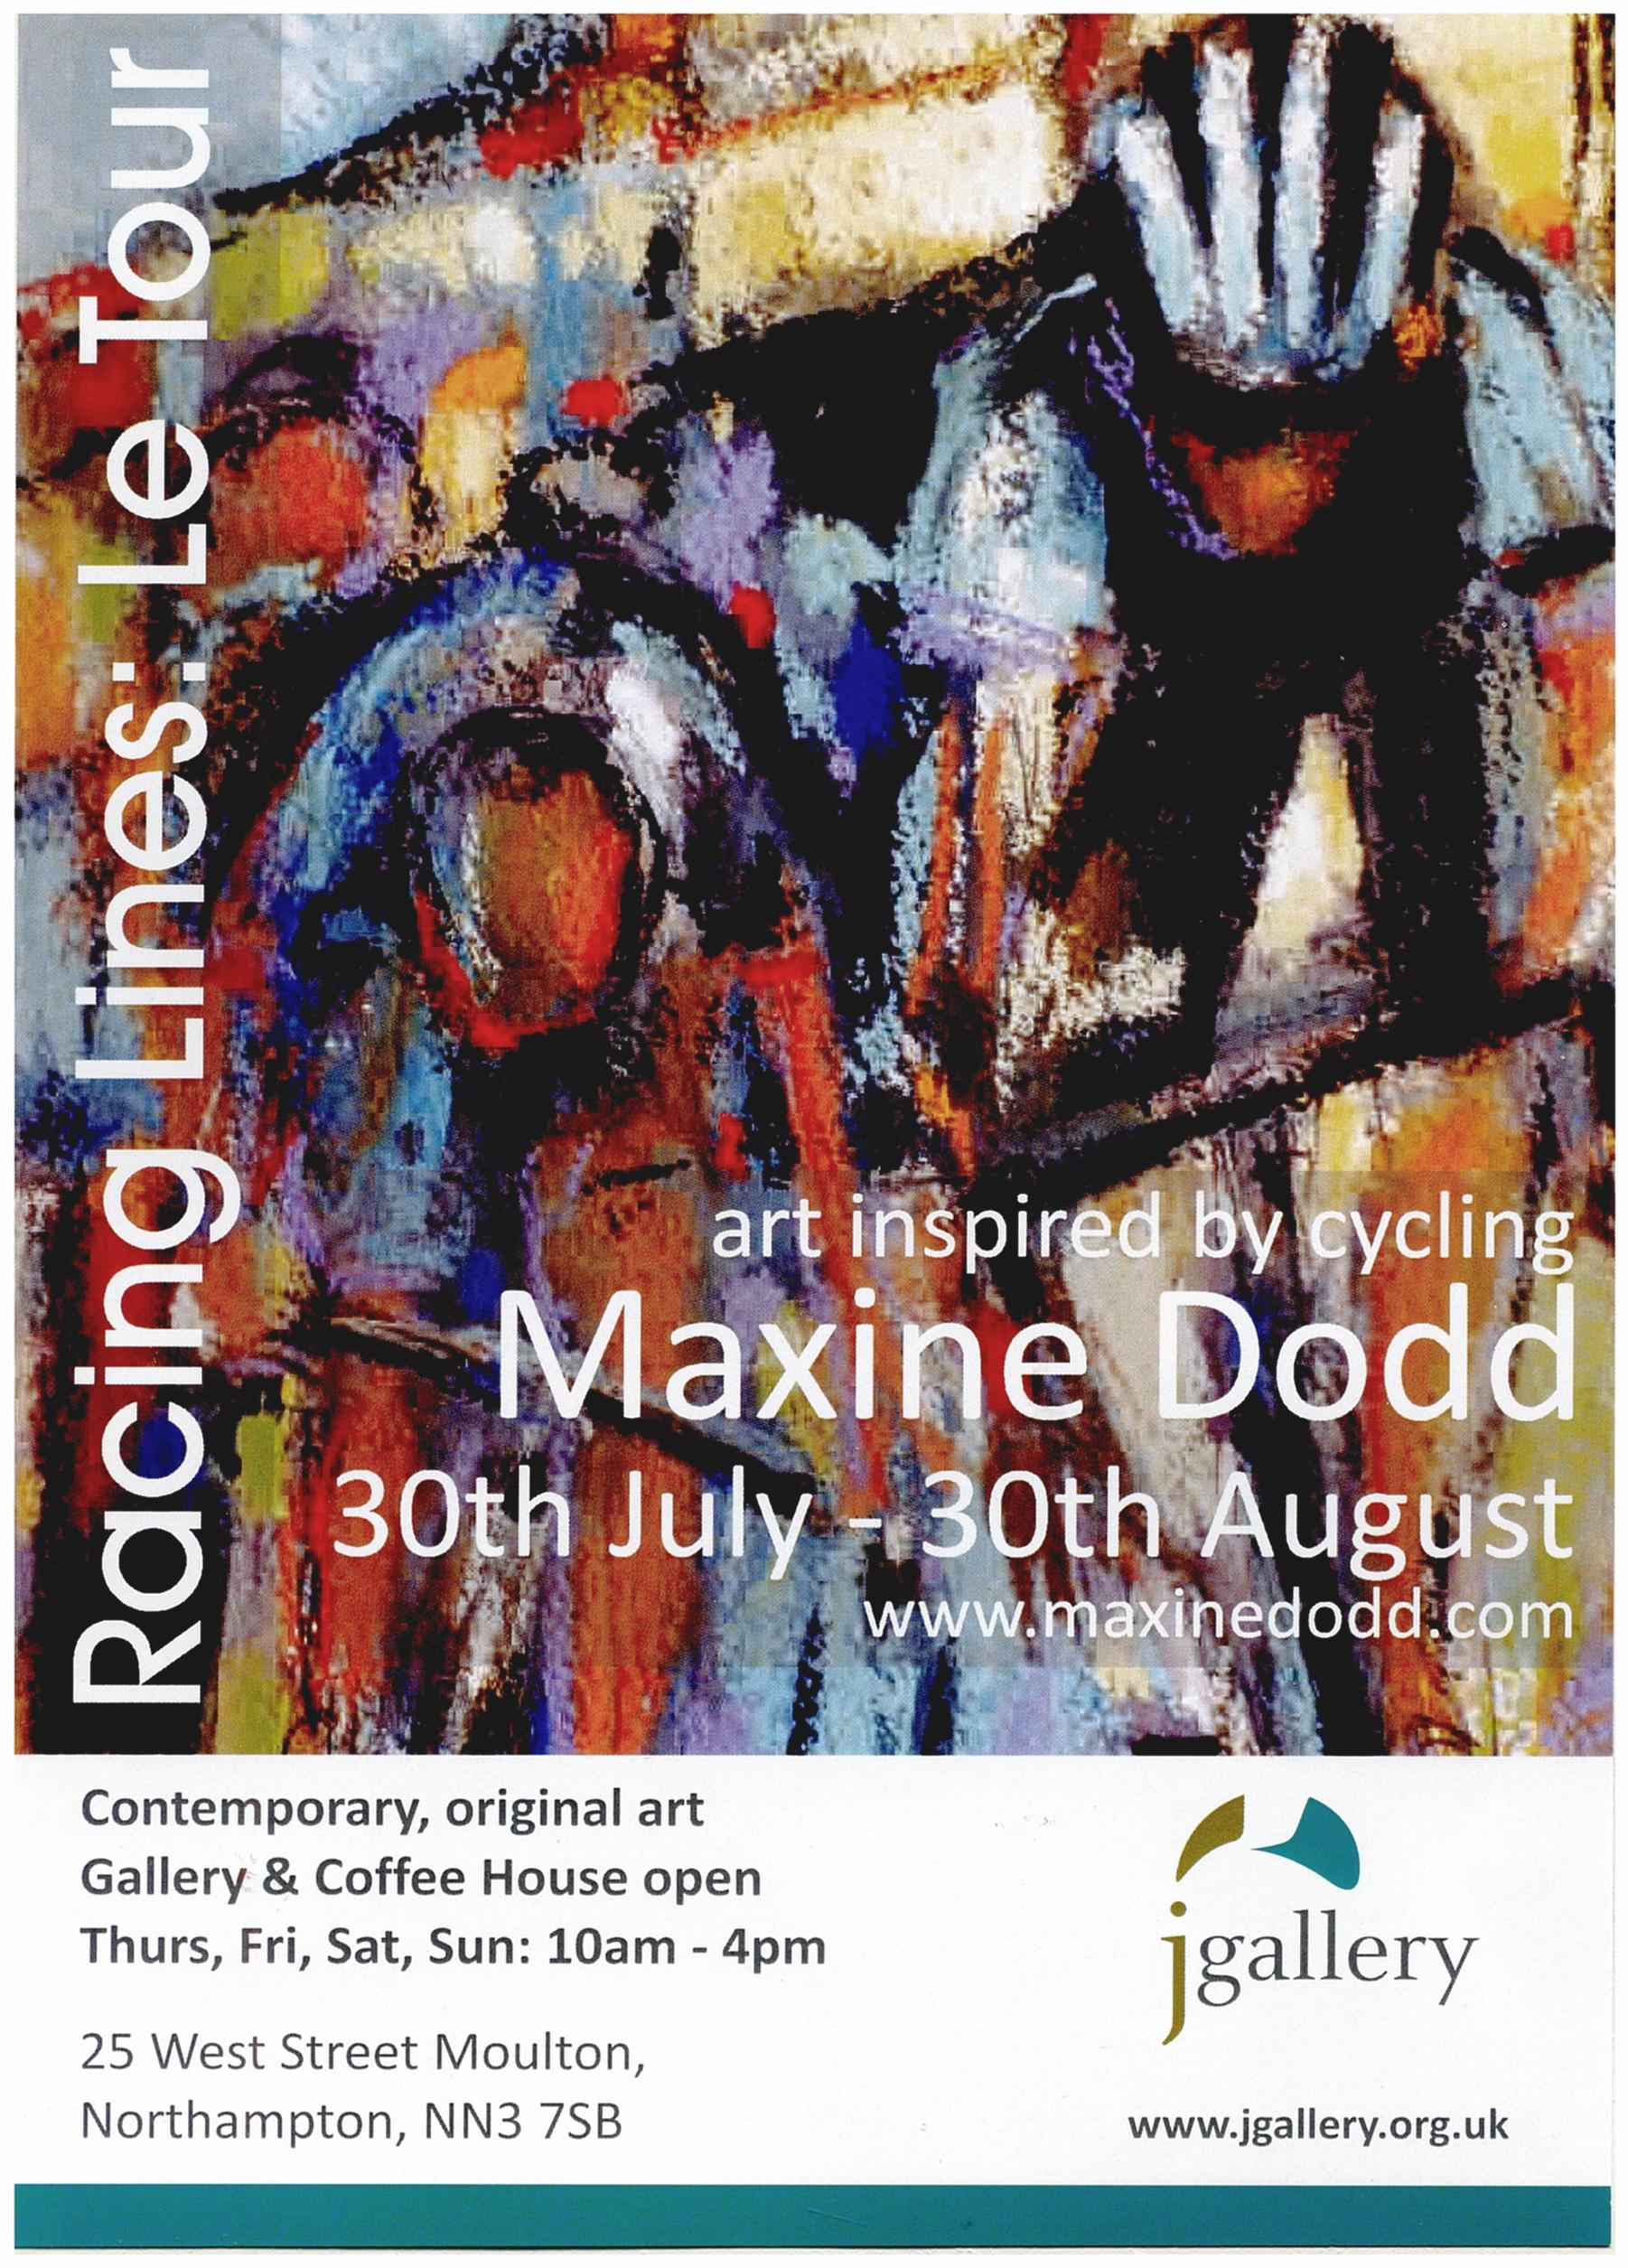 Maxine Dodd, 'Racing Lines: Le Tour' exhibition